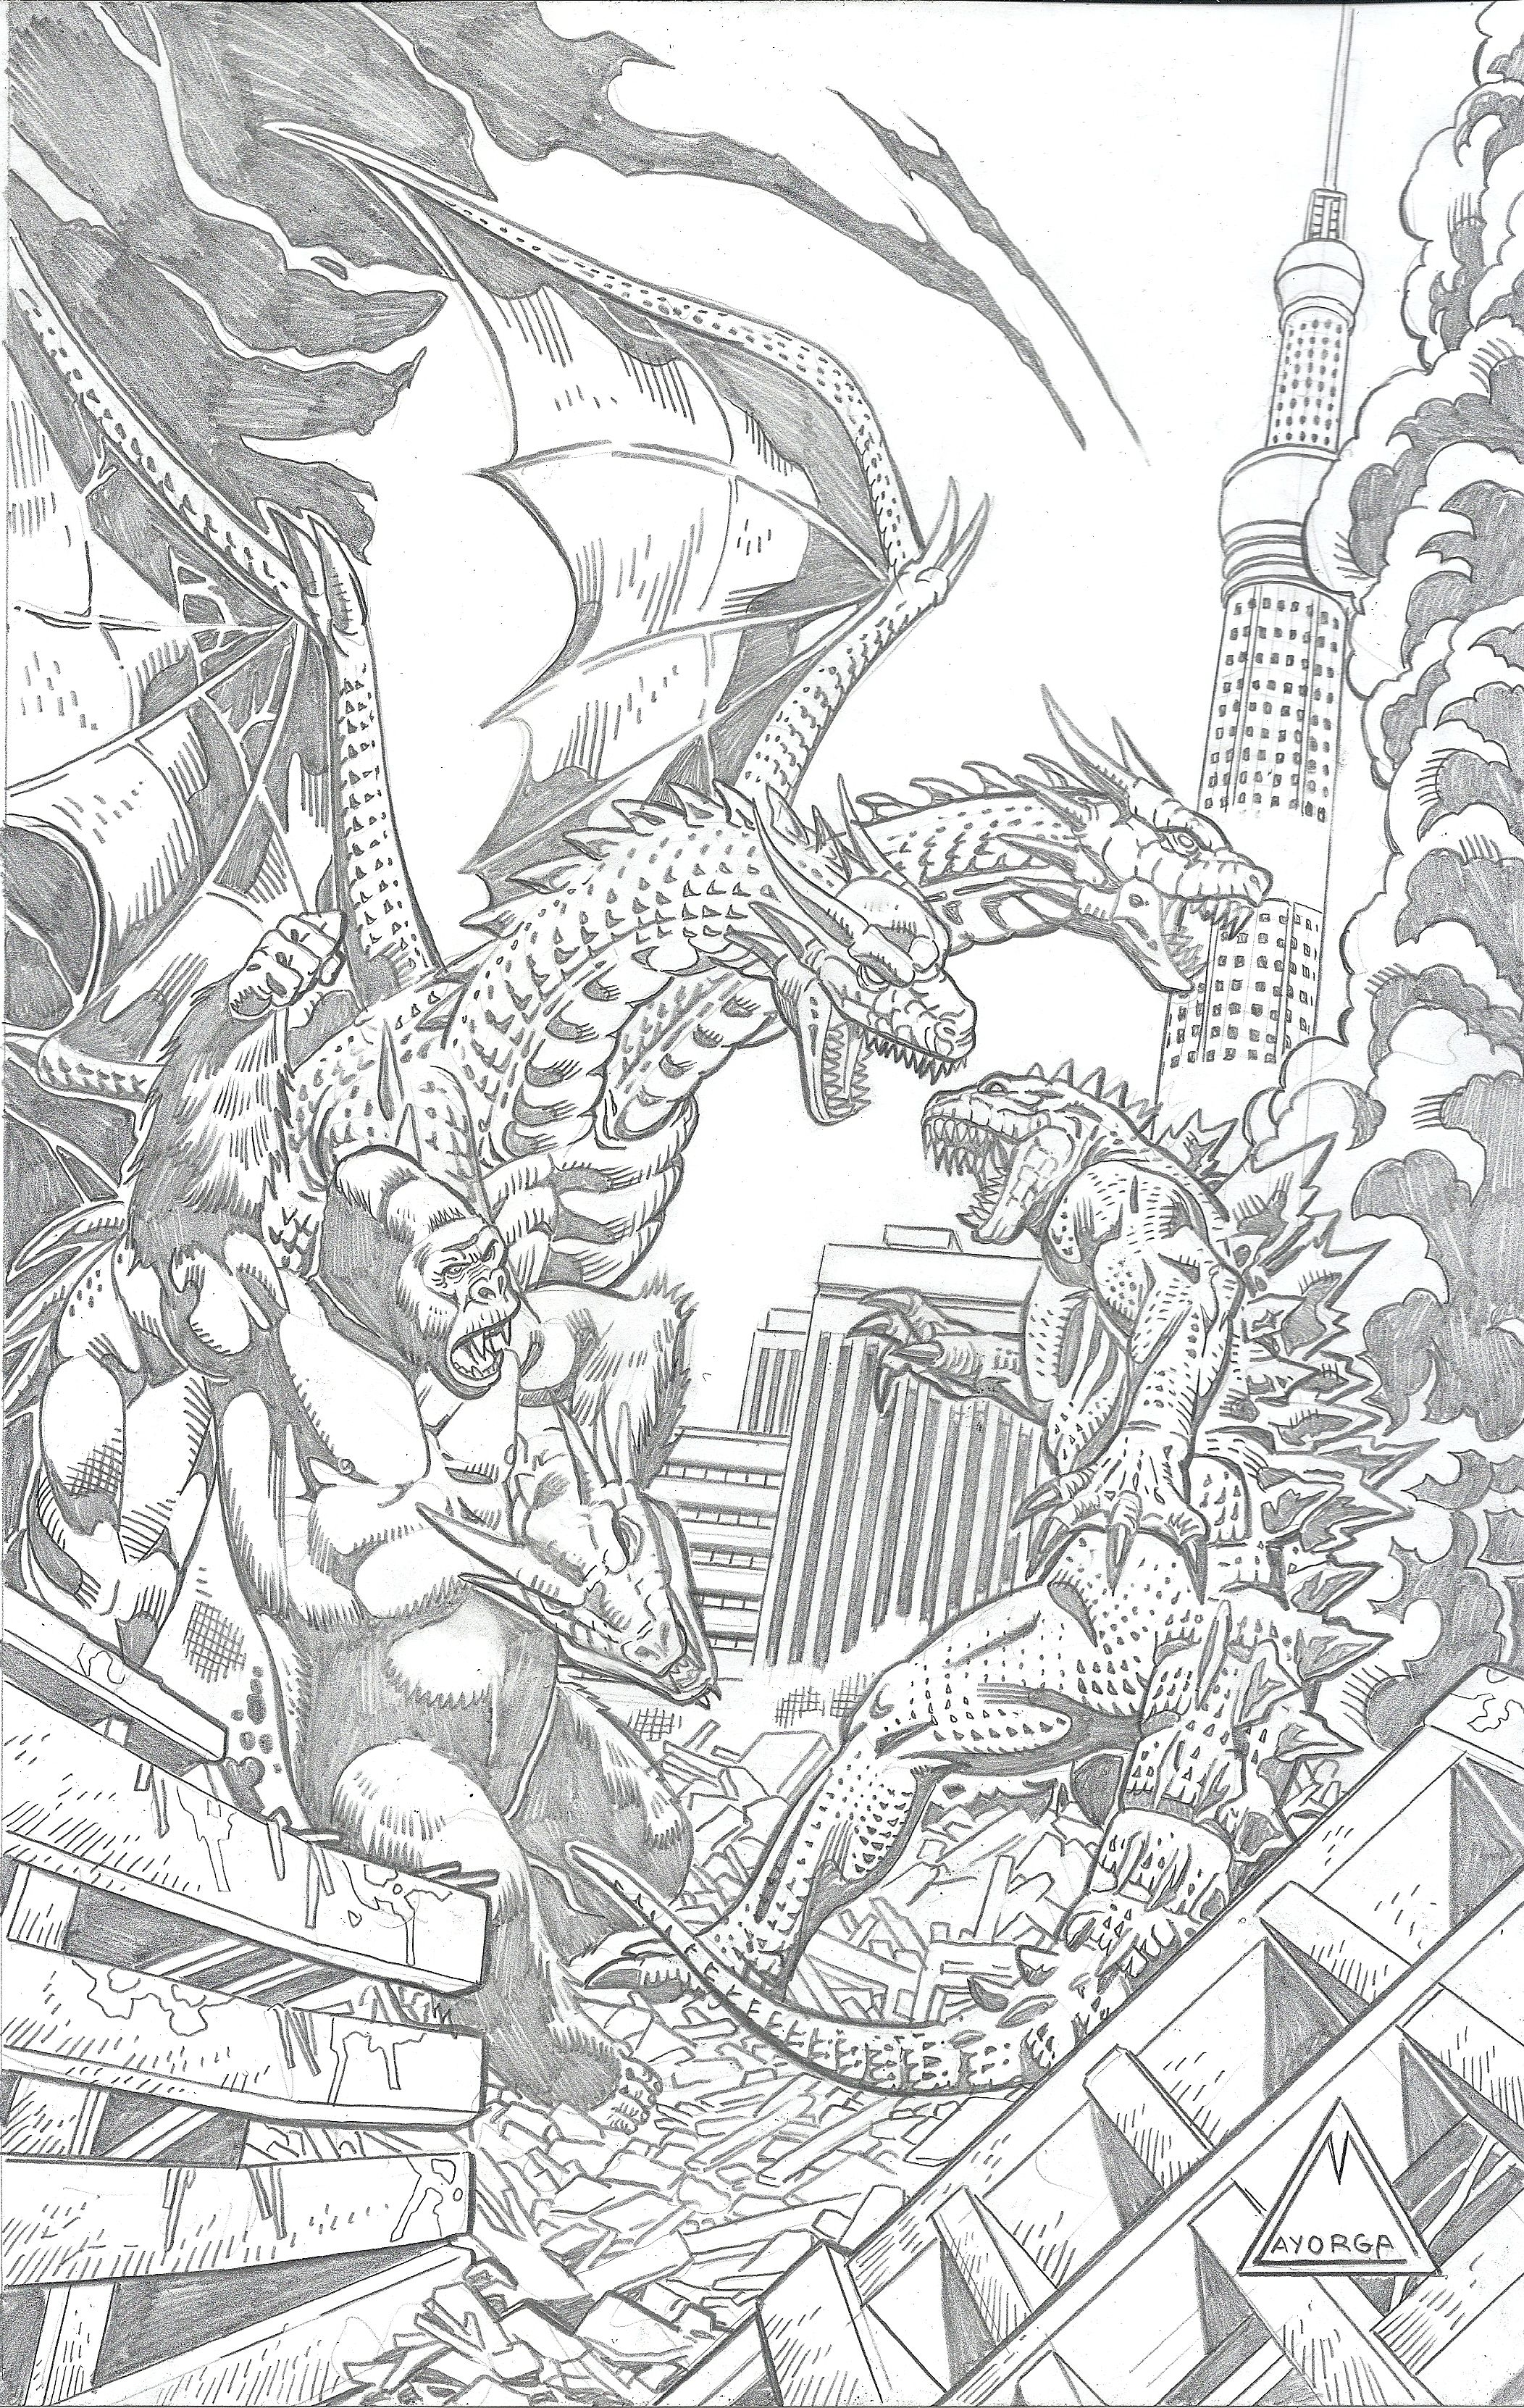 King Kong And Godzilla Vs Ghidorah Godzilla Vs King Ghidorah Classic Monster Movies Godzilla